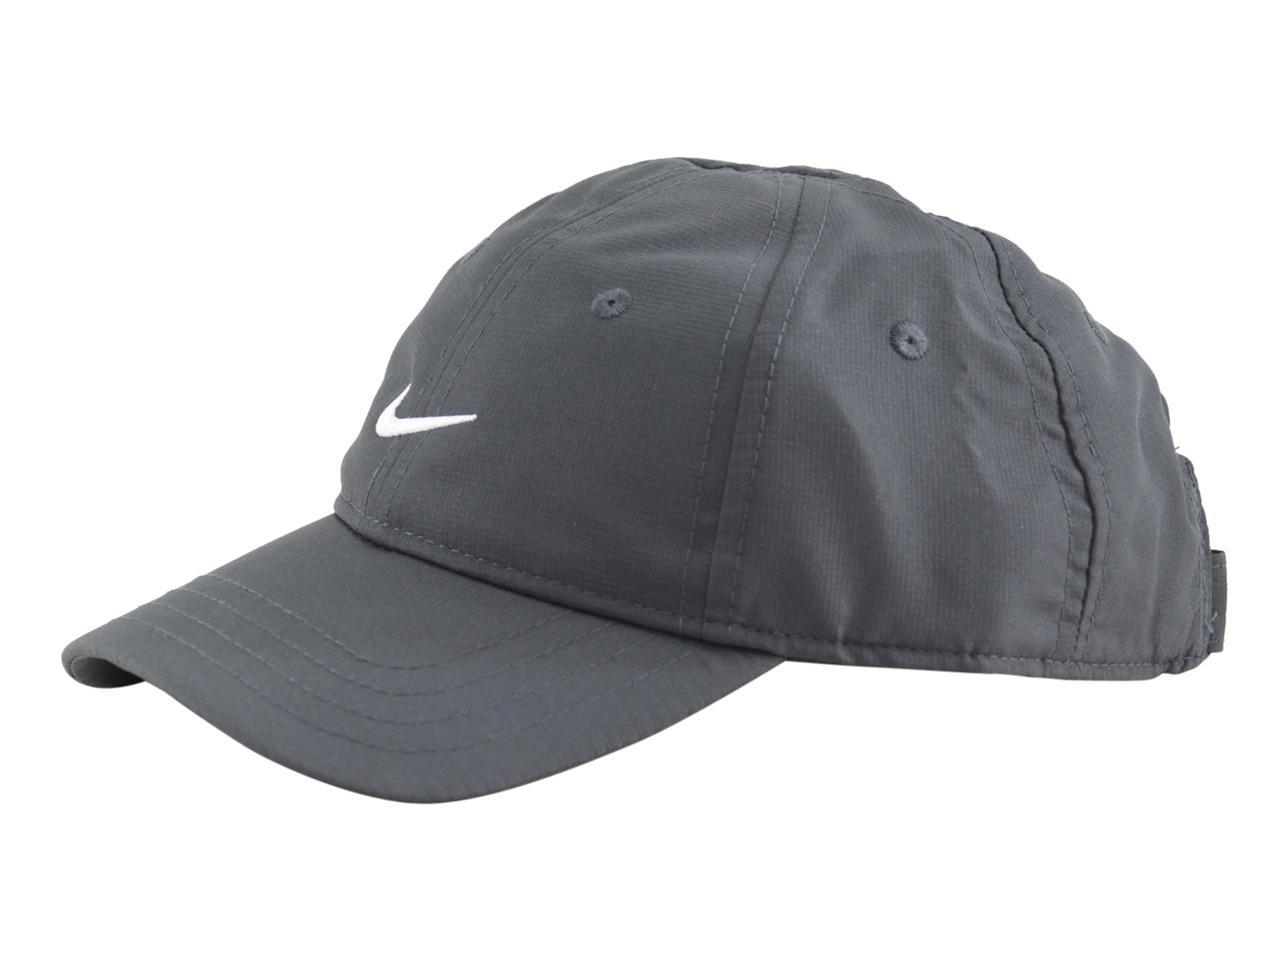 5d1462dd4779e Nike Infant Toddler Boy s Aerobill Strapback Baseball Cap Hat